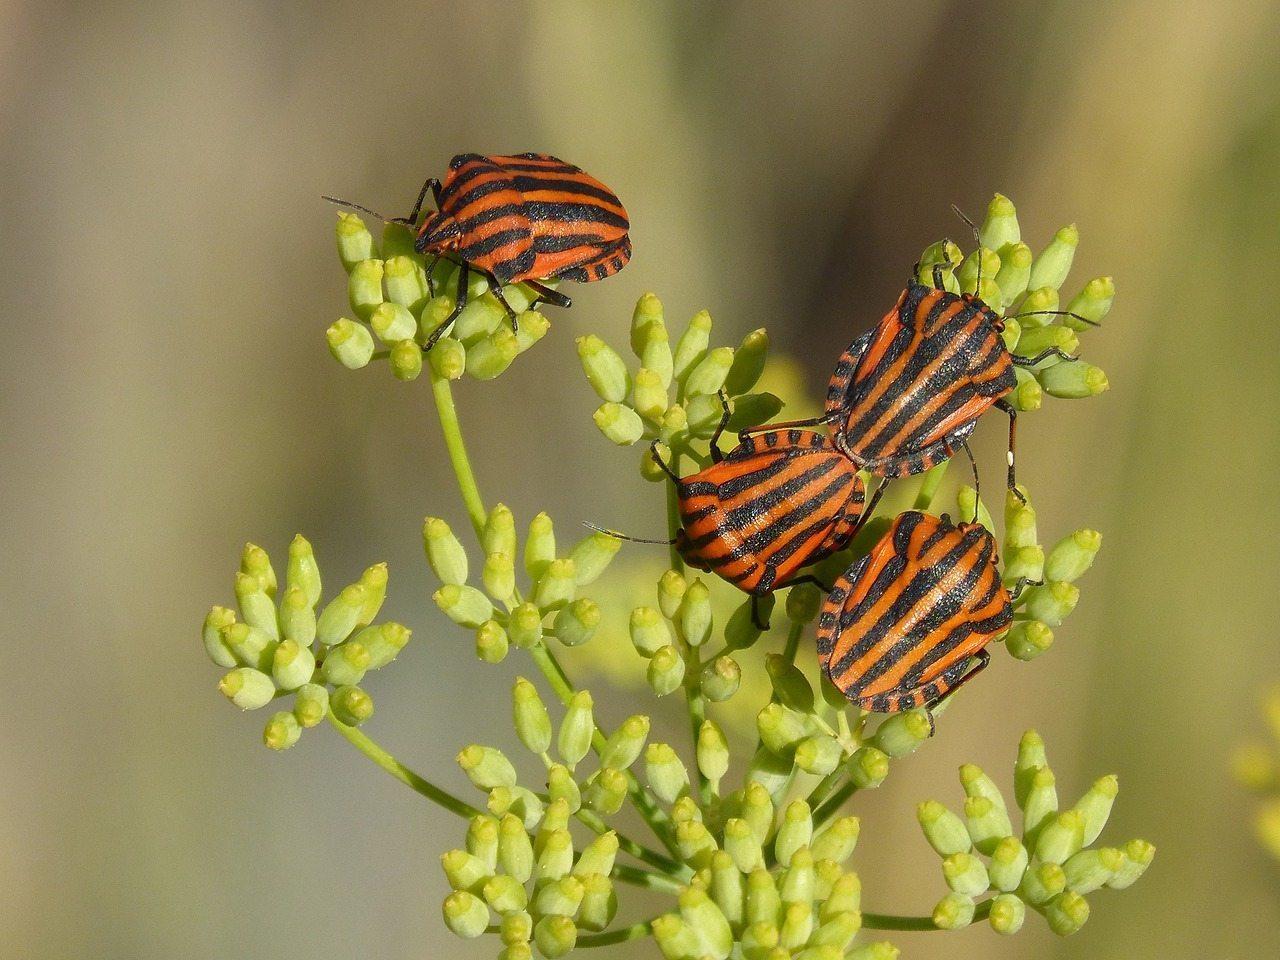 Image: Beetles pollinating